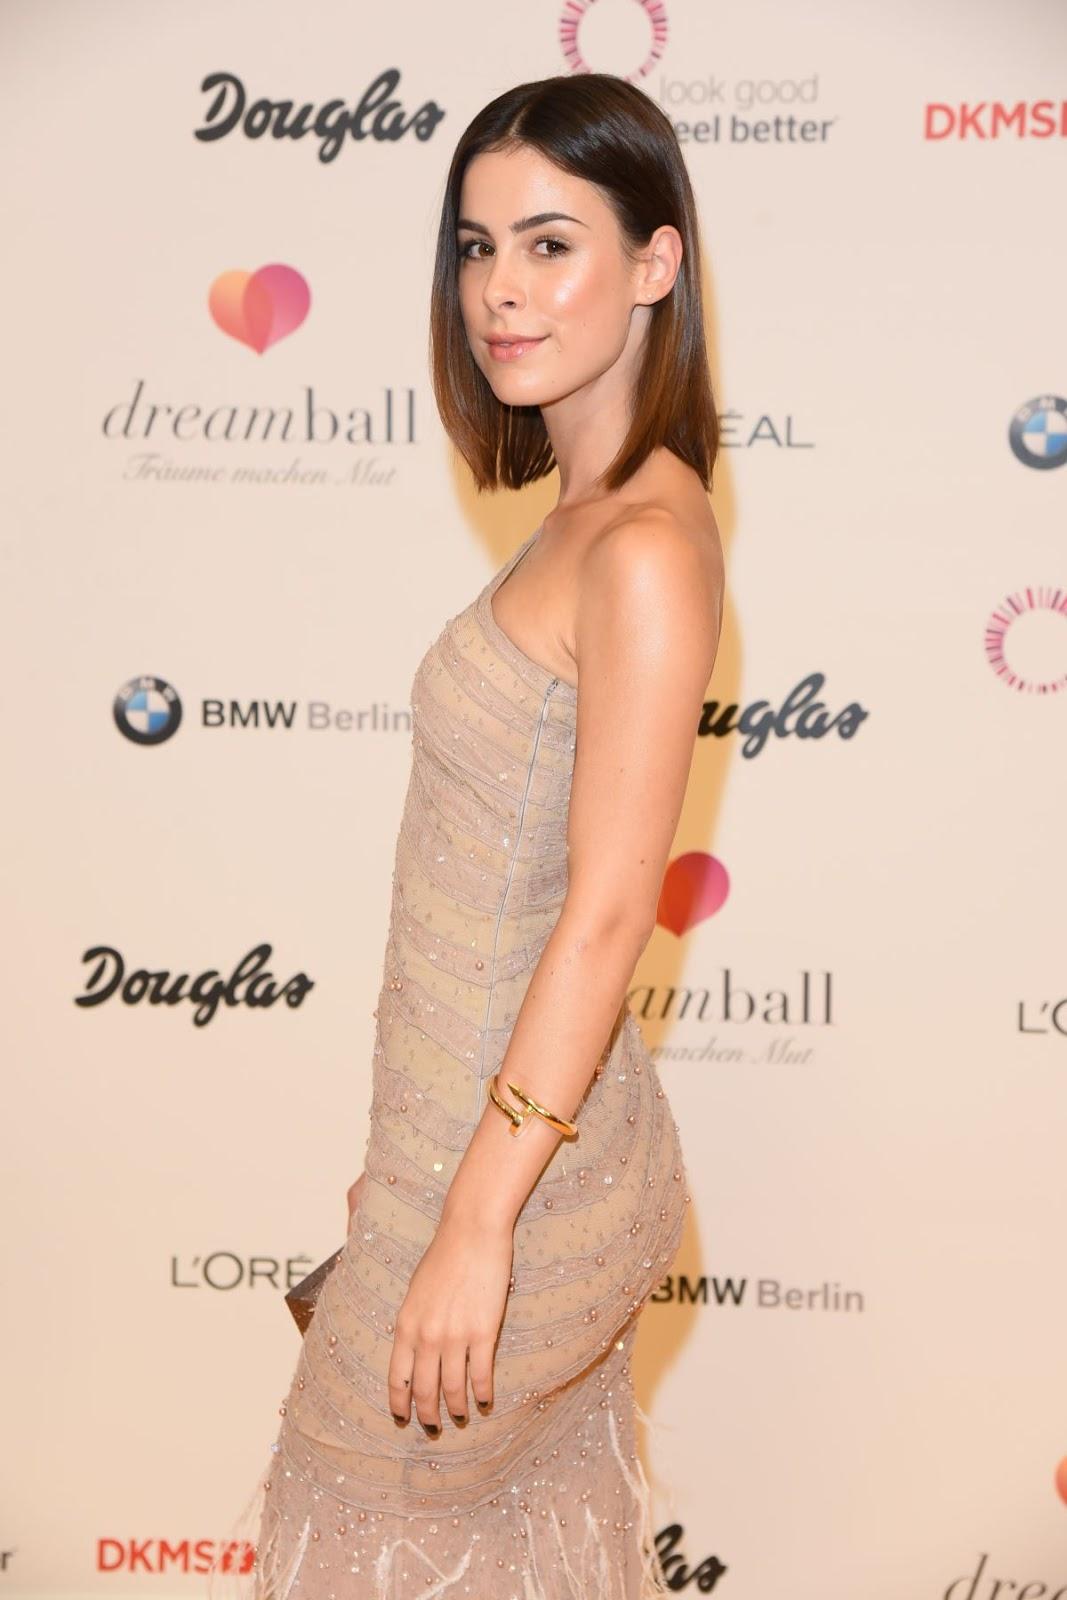 Lena Meyer-Landrut at DKMS Dreamball 2016